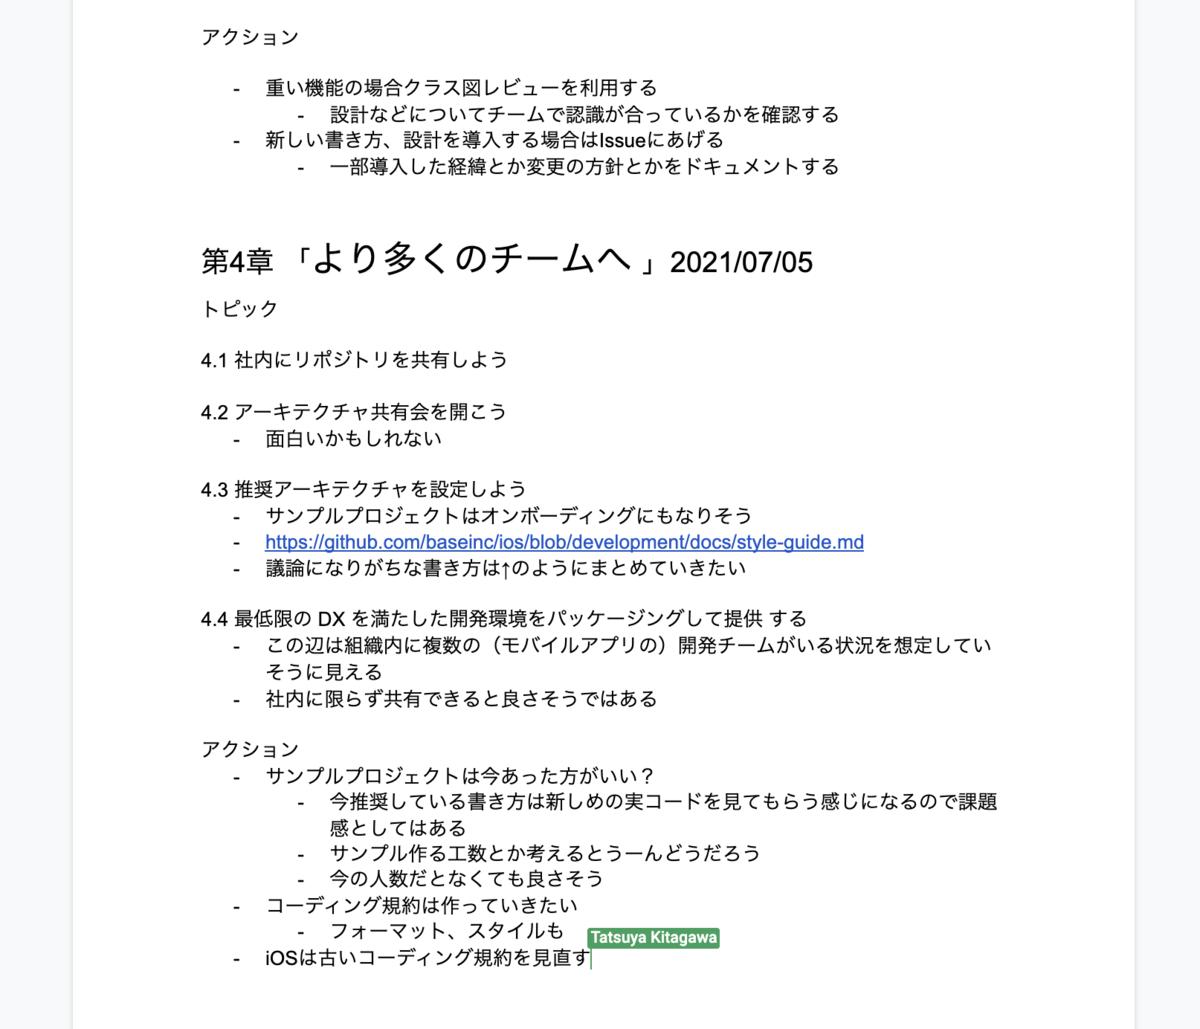 f:id:tatsuyakit:20210914145815p:plain